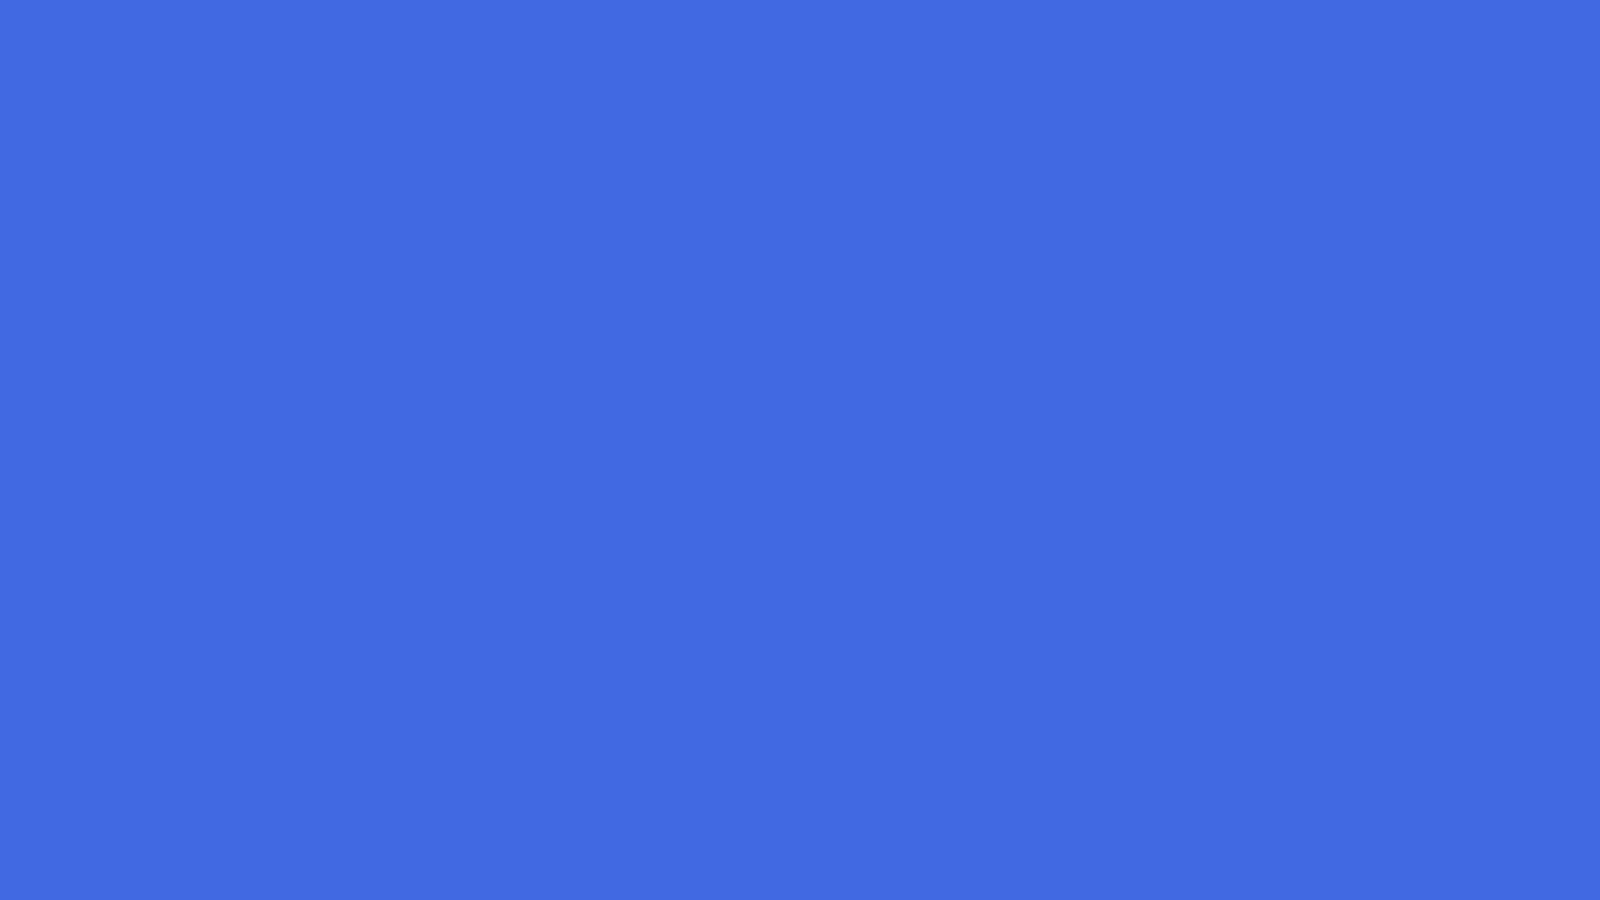 43+ plain blue background images